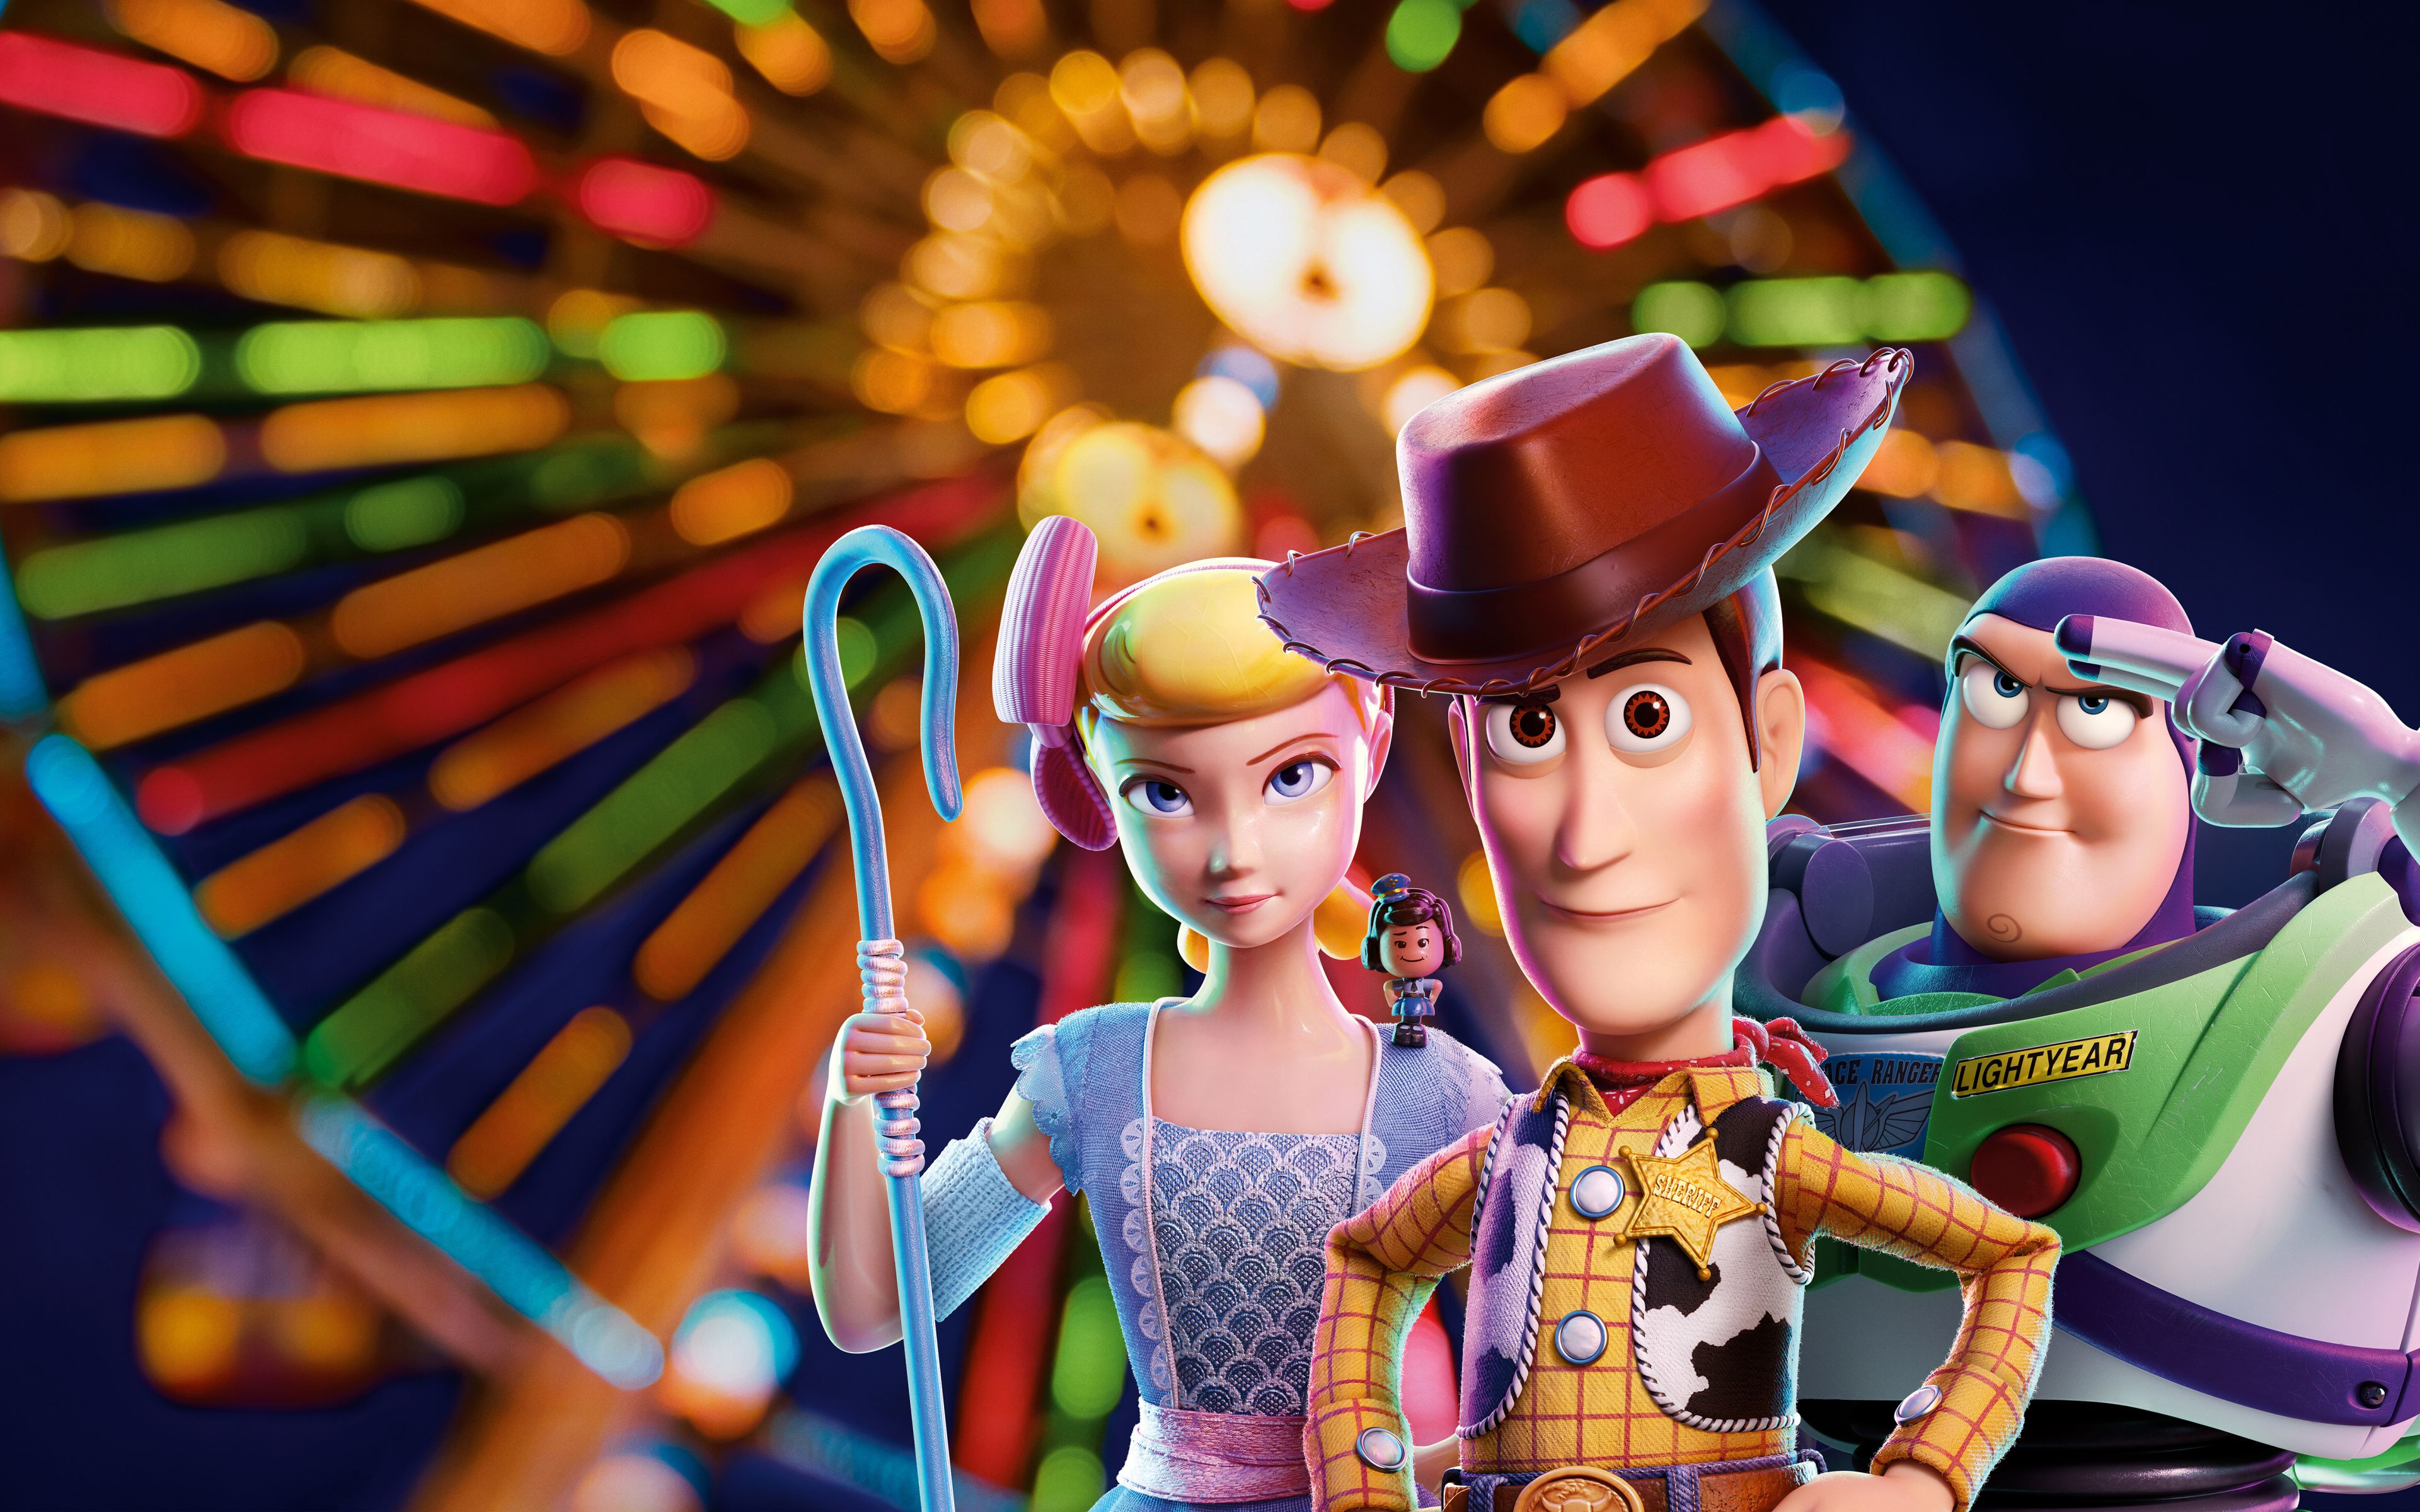 3840x2400 Toy Story 4 Bo Peep Woody Buzz Lightyear Movie Wallpaper